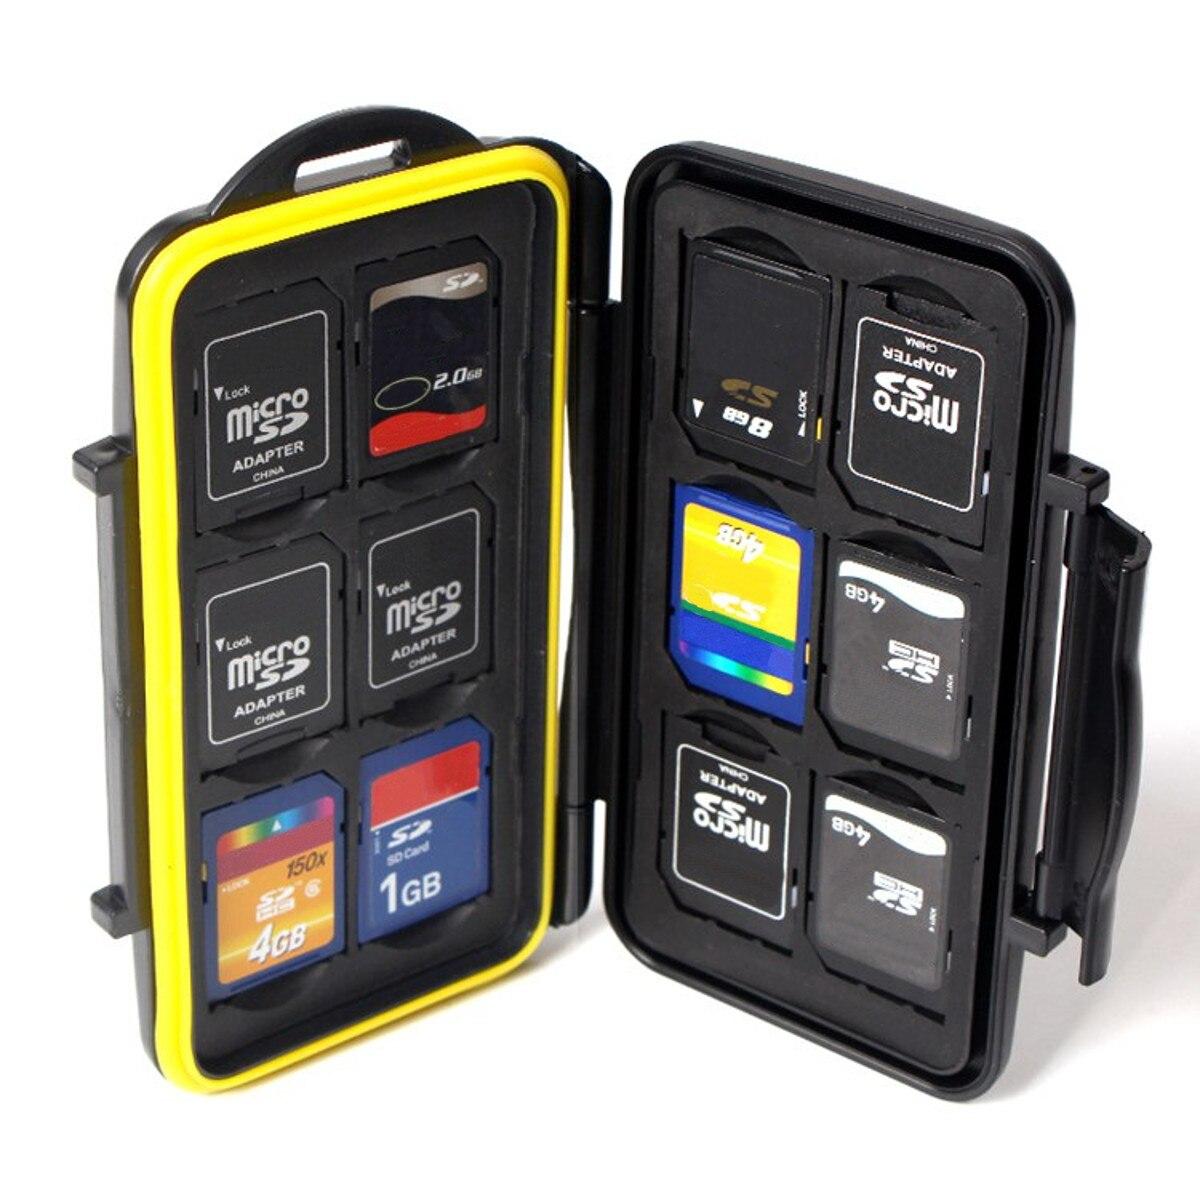 12SD + 12TF impermeable tarjeta de memoria caja de almacenamiento titular tarjeta de memoria bolsa de transporte todo en uno bolsa de tarjeta de memoria de cámara antichoque